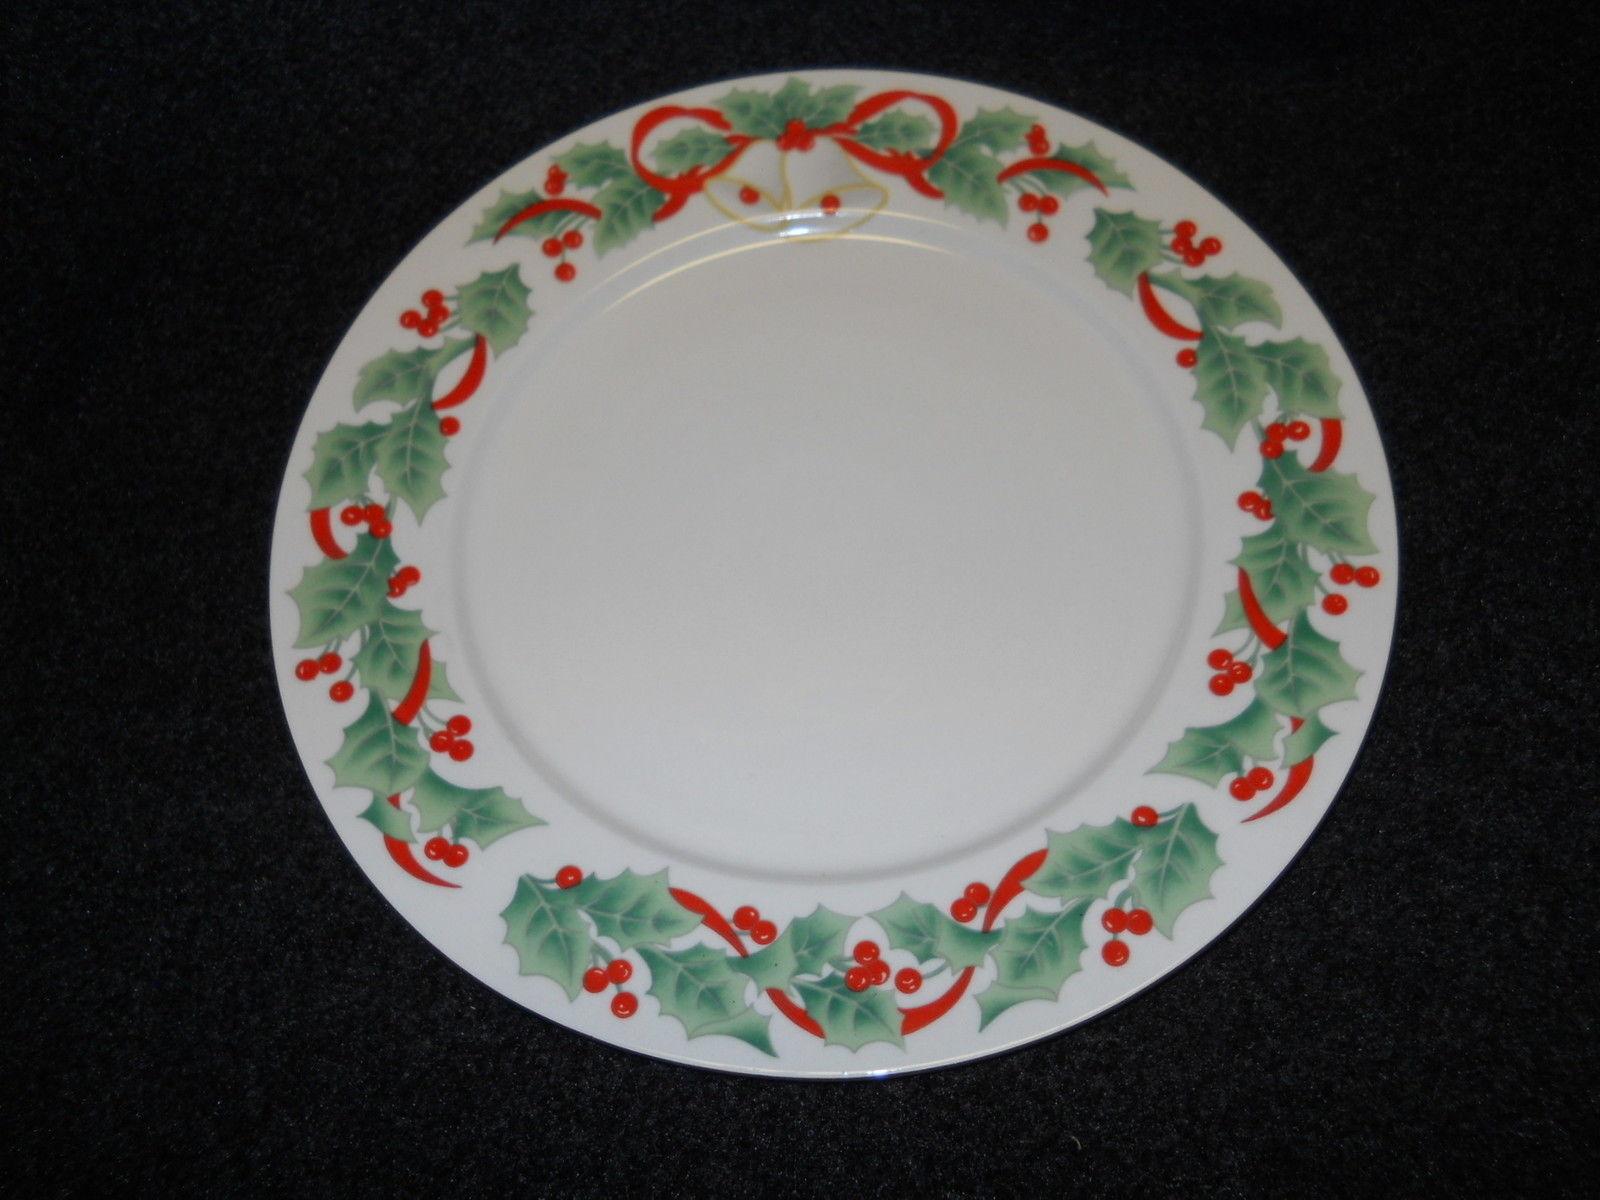 Sango Noel 8401 Dinner Plate Sango & Sango Dinner Plates - Castrophotos